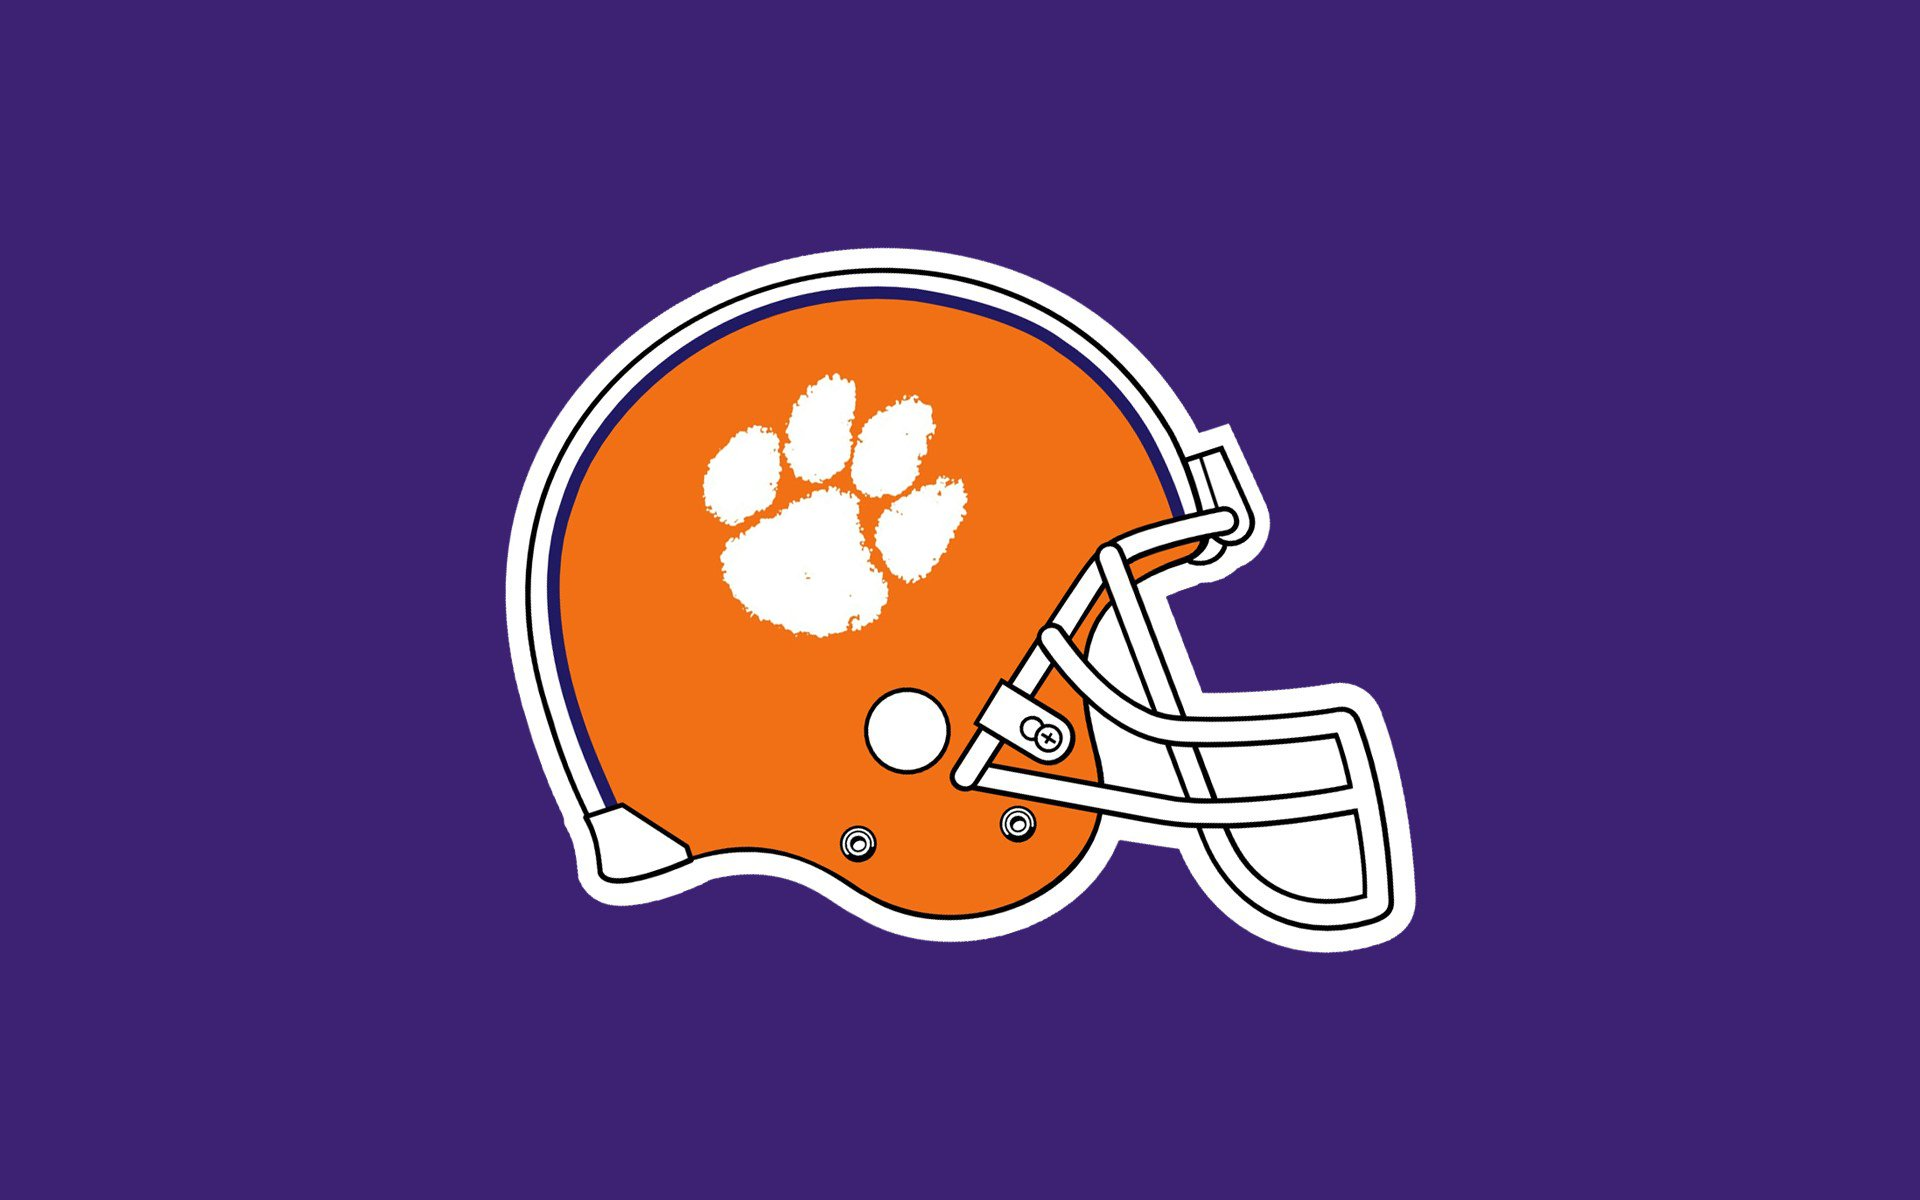 Clemson Tigers College Football Wallpaper 1920x1200 593972